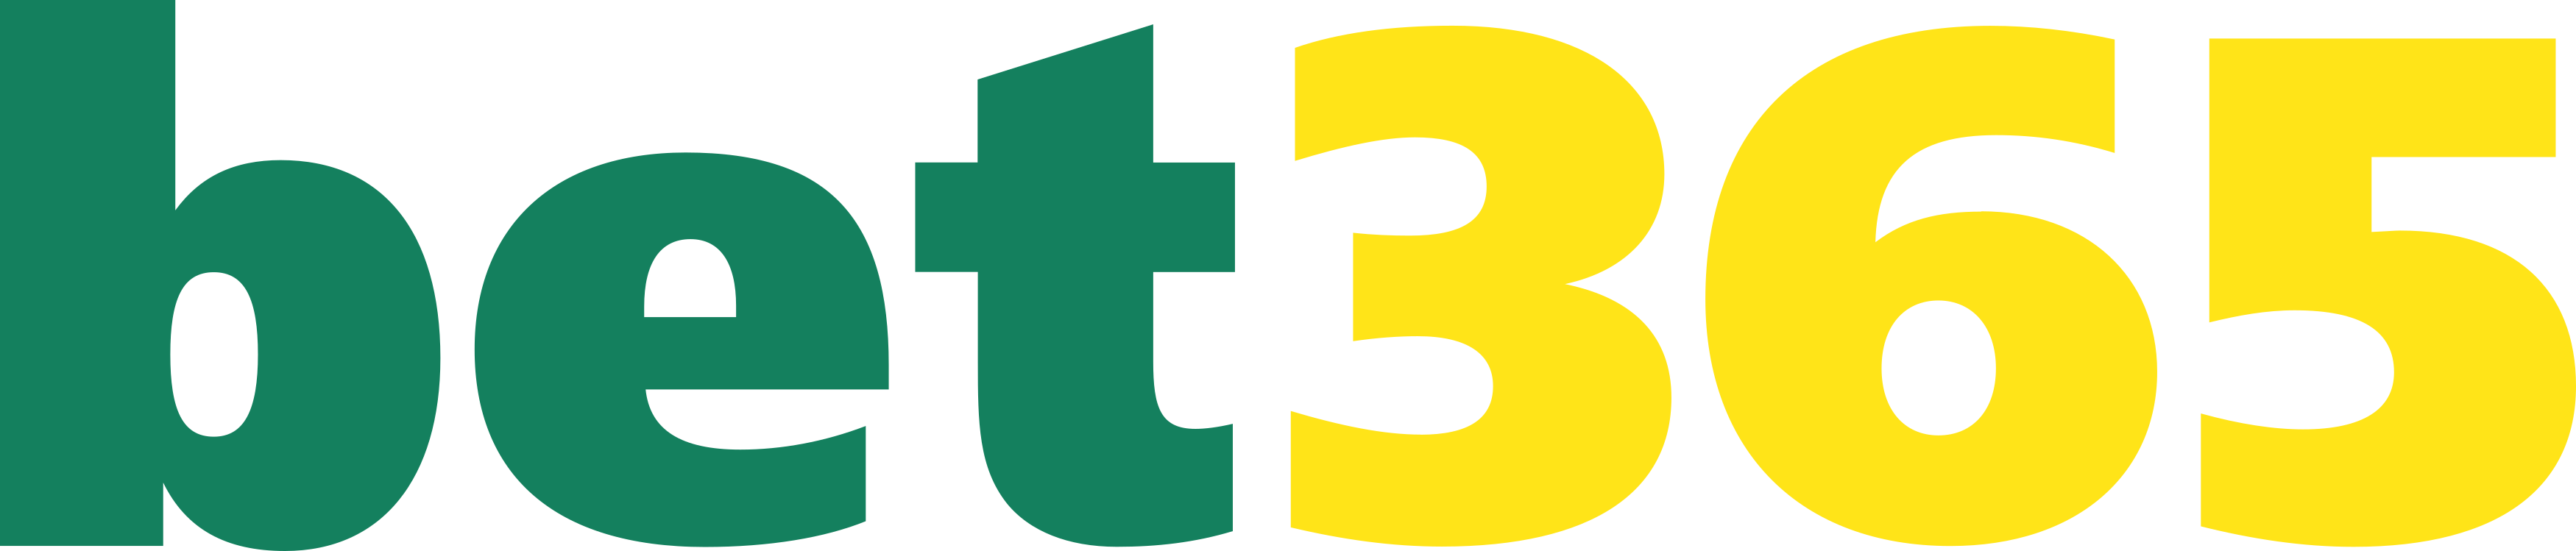 bet365-logo-